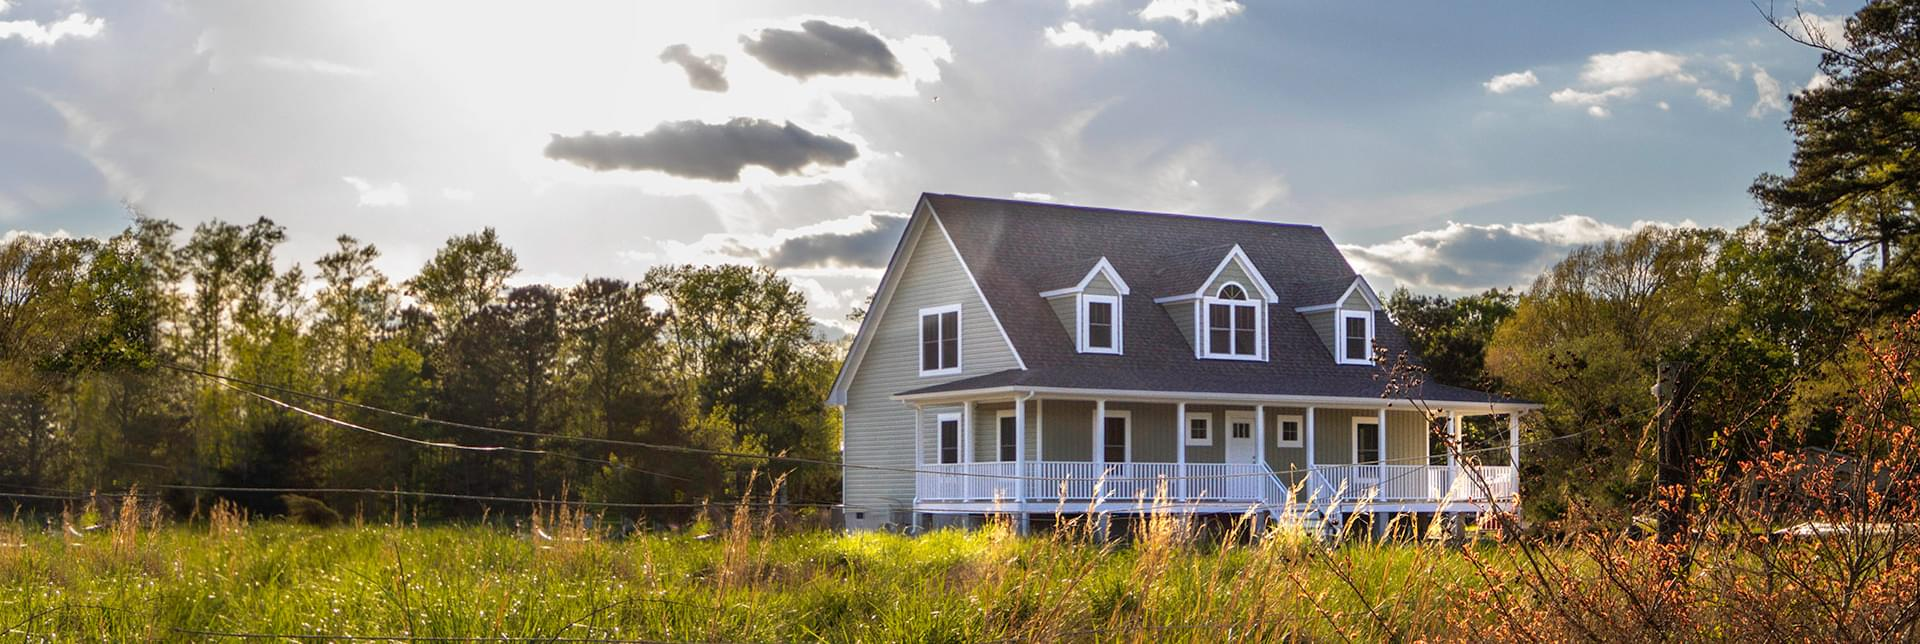 New Homes in Pittsylvania County VA